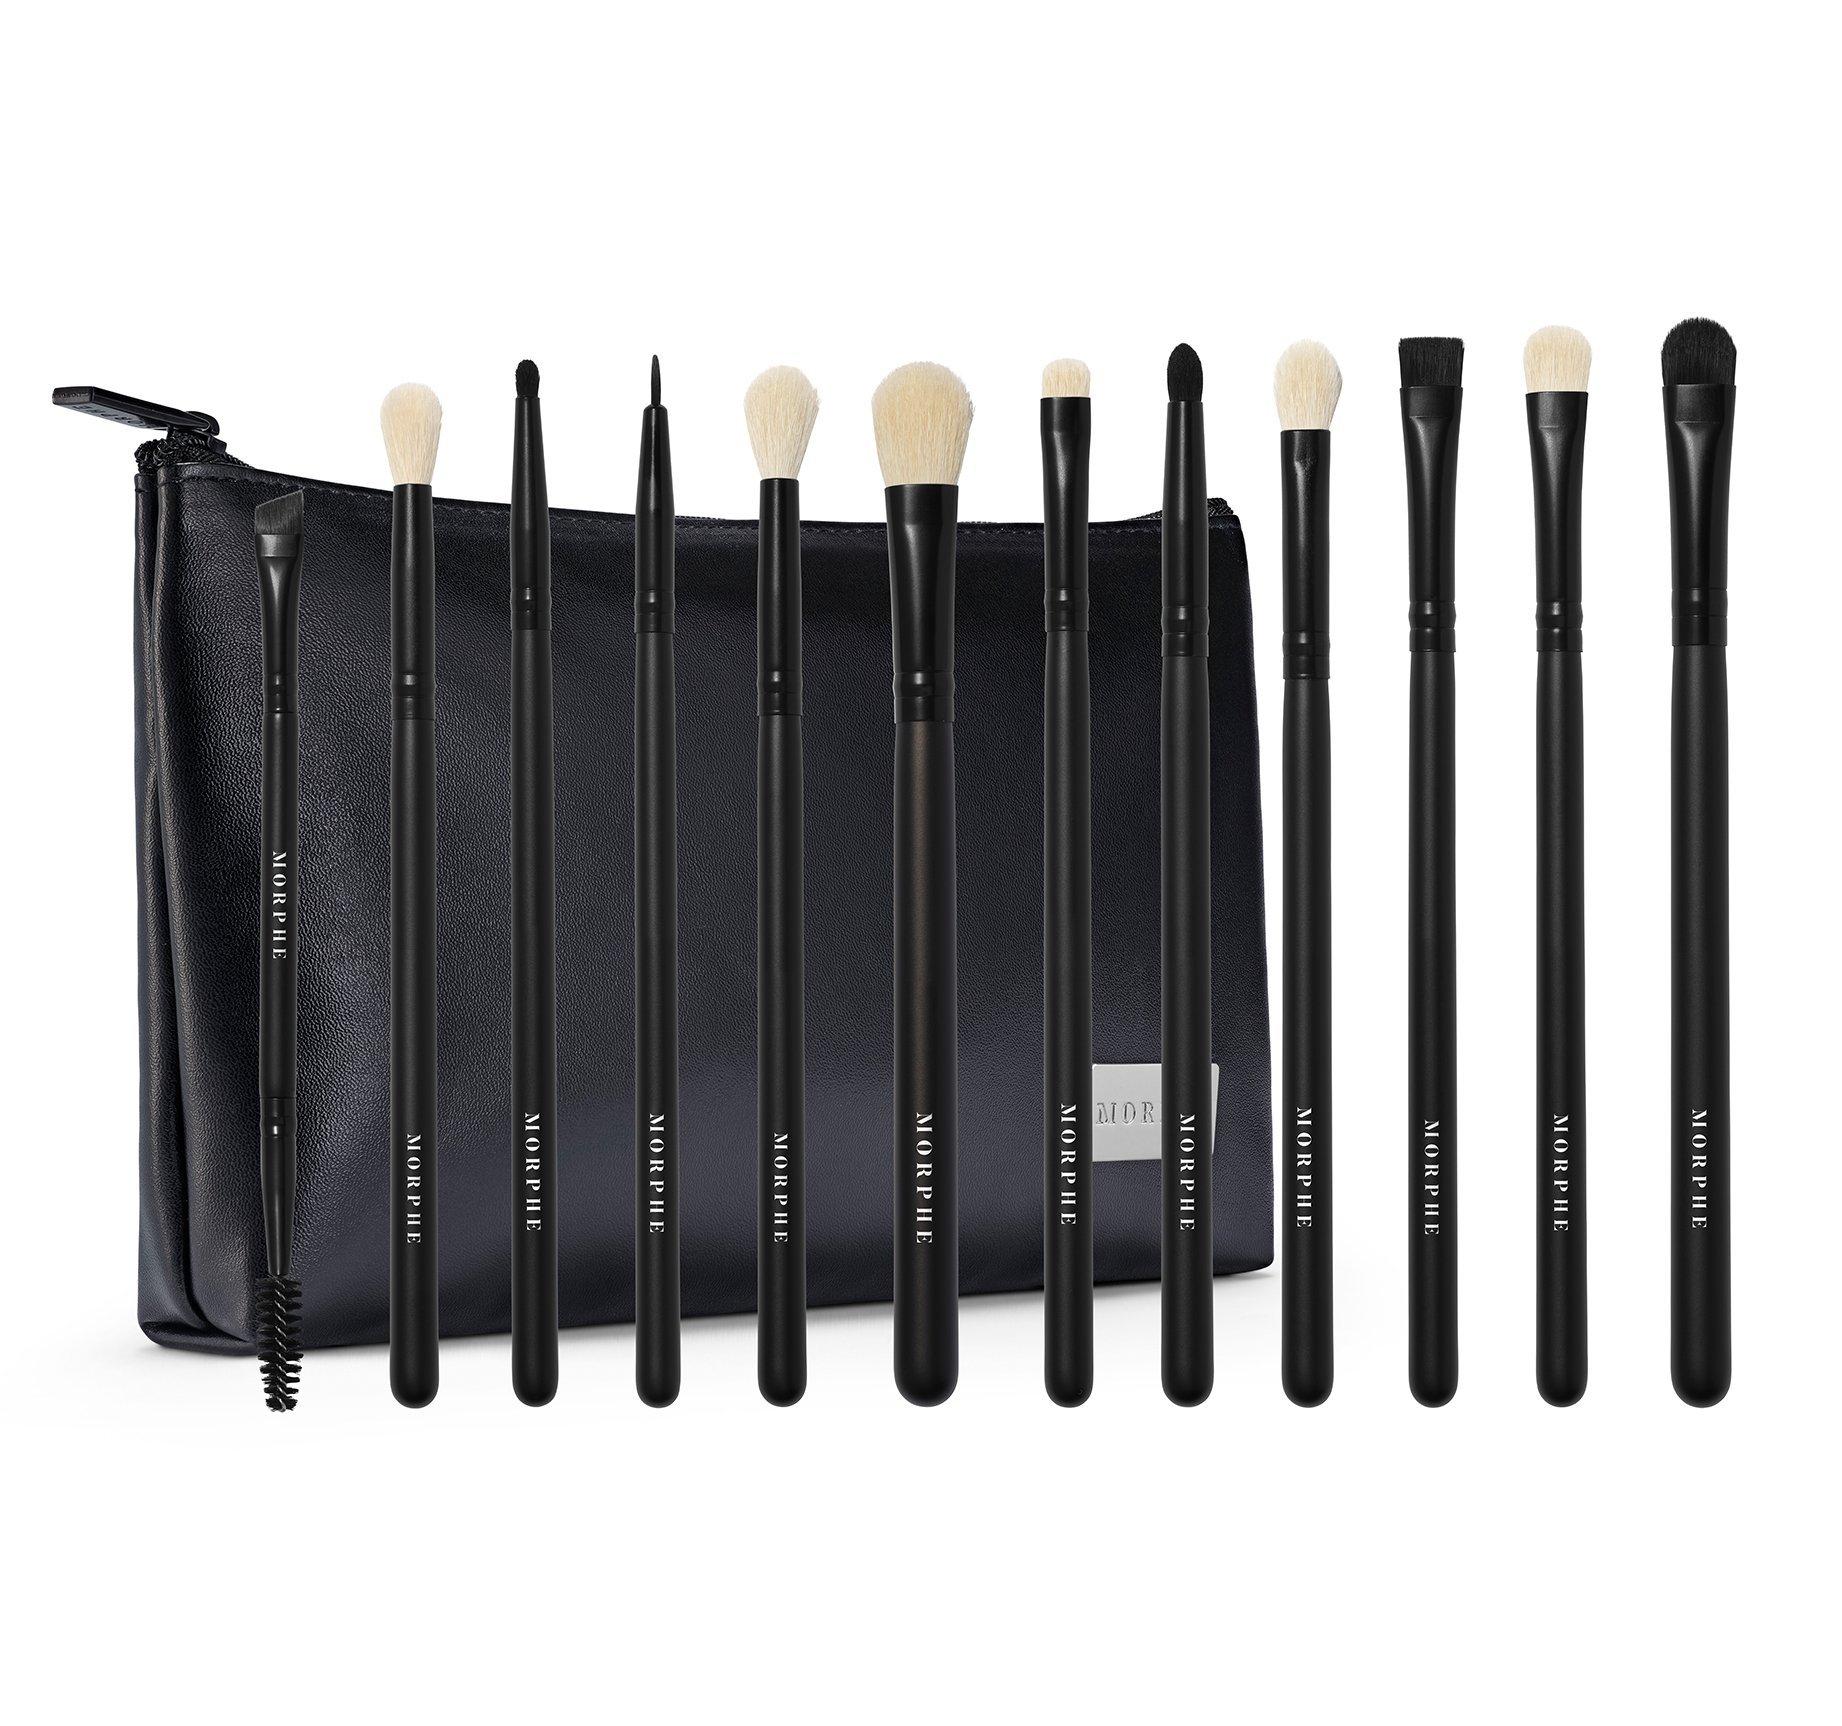 Morphe Eye Obsessed Brush Collection (12 brushes) - £15 / £20 Delivered @ Morphe